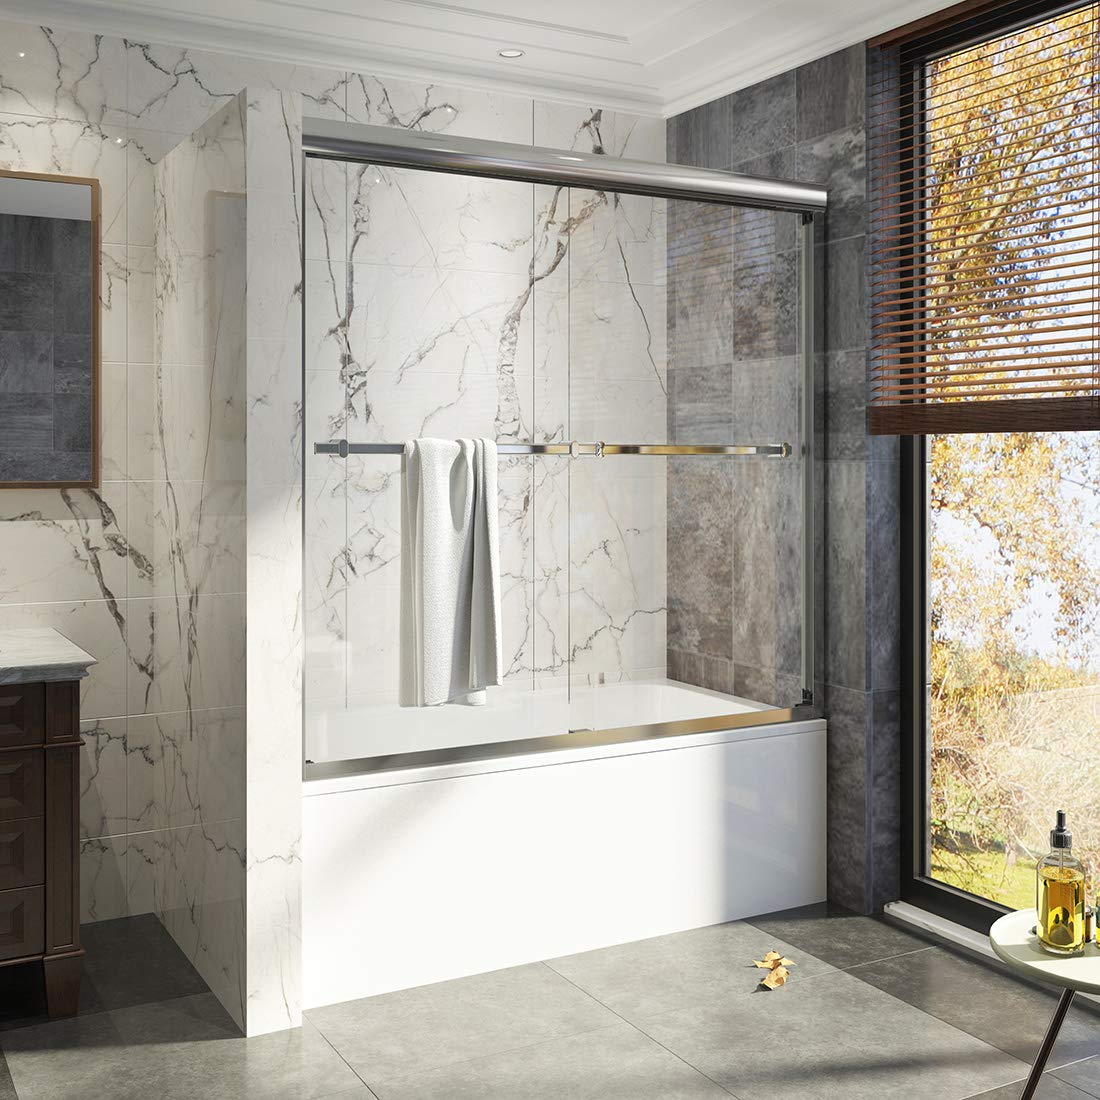 Best Rated In Bathtub Sliding Doors Amp Helpful Customer